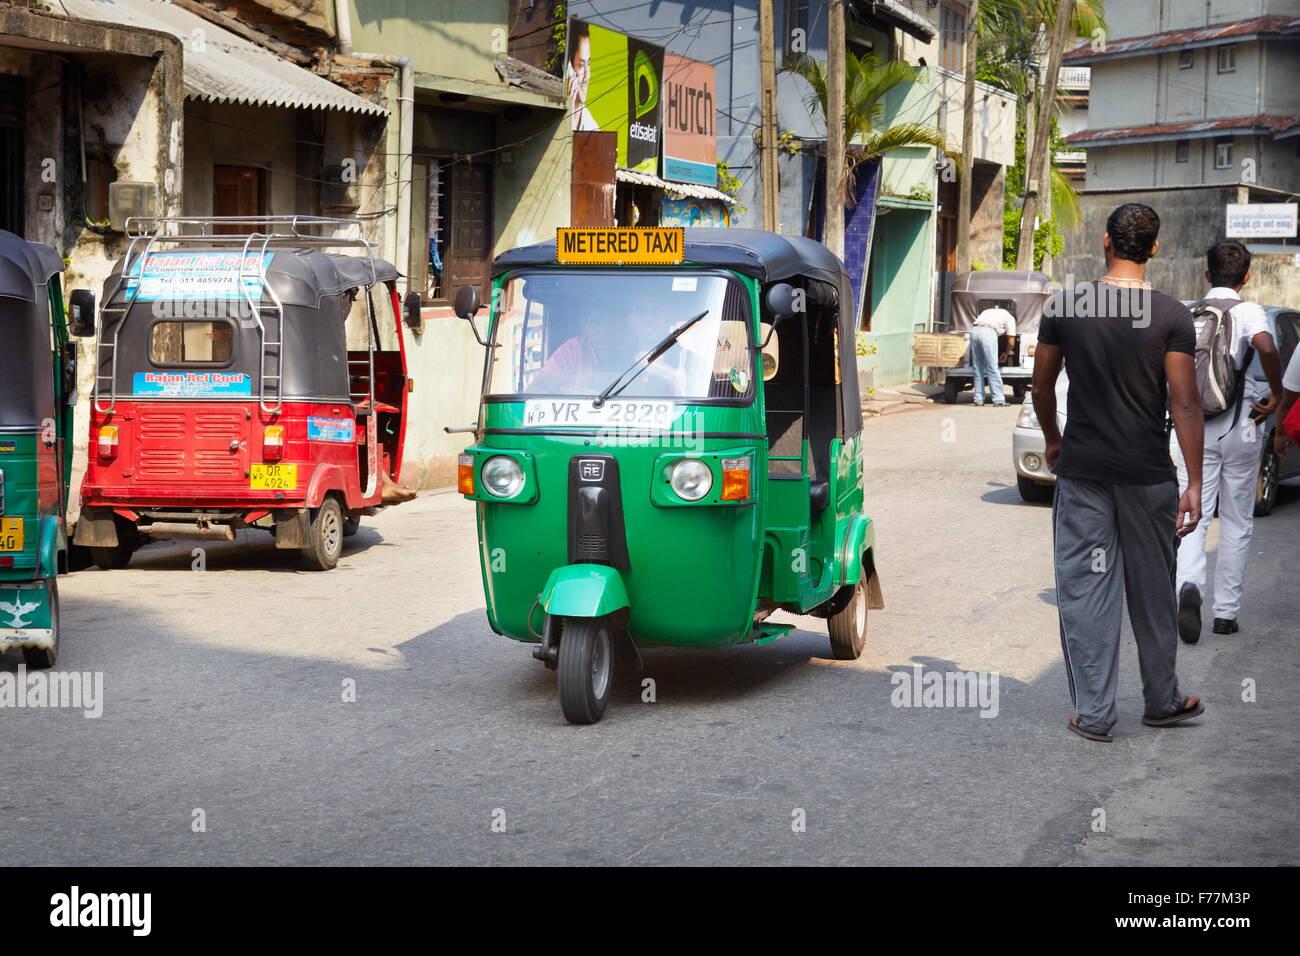 Sri Lanka - Colombo, tuk-tuk de taxi, transporte típico Imagen De Stock